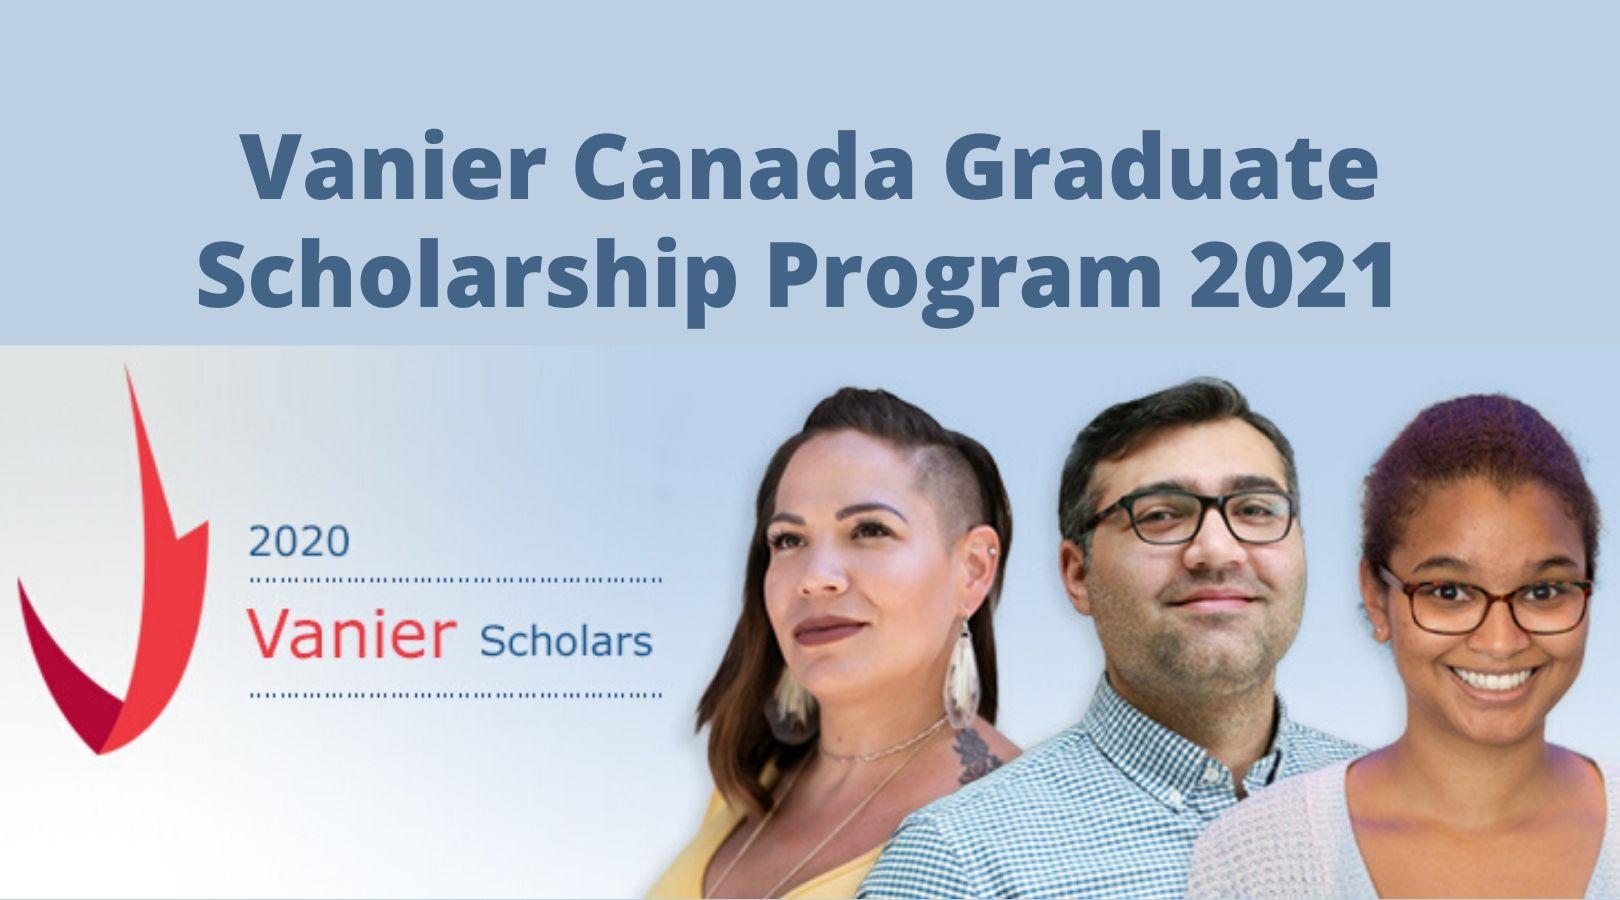 Vanier Canada Graduate Scholarship Program 2021 for Doctoral Study in Canada ($50,000 per year)